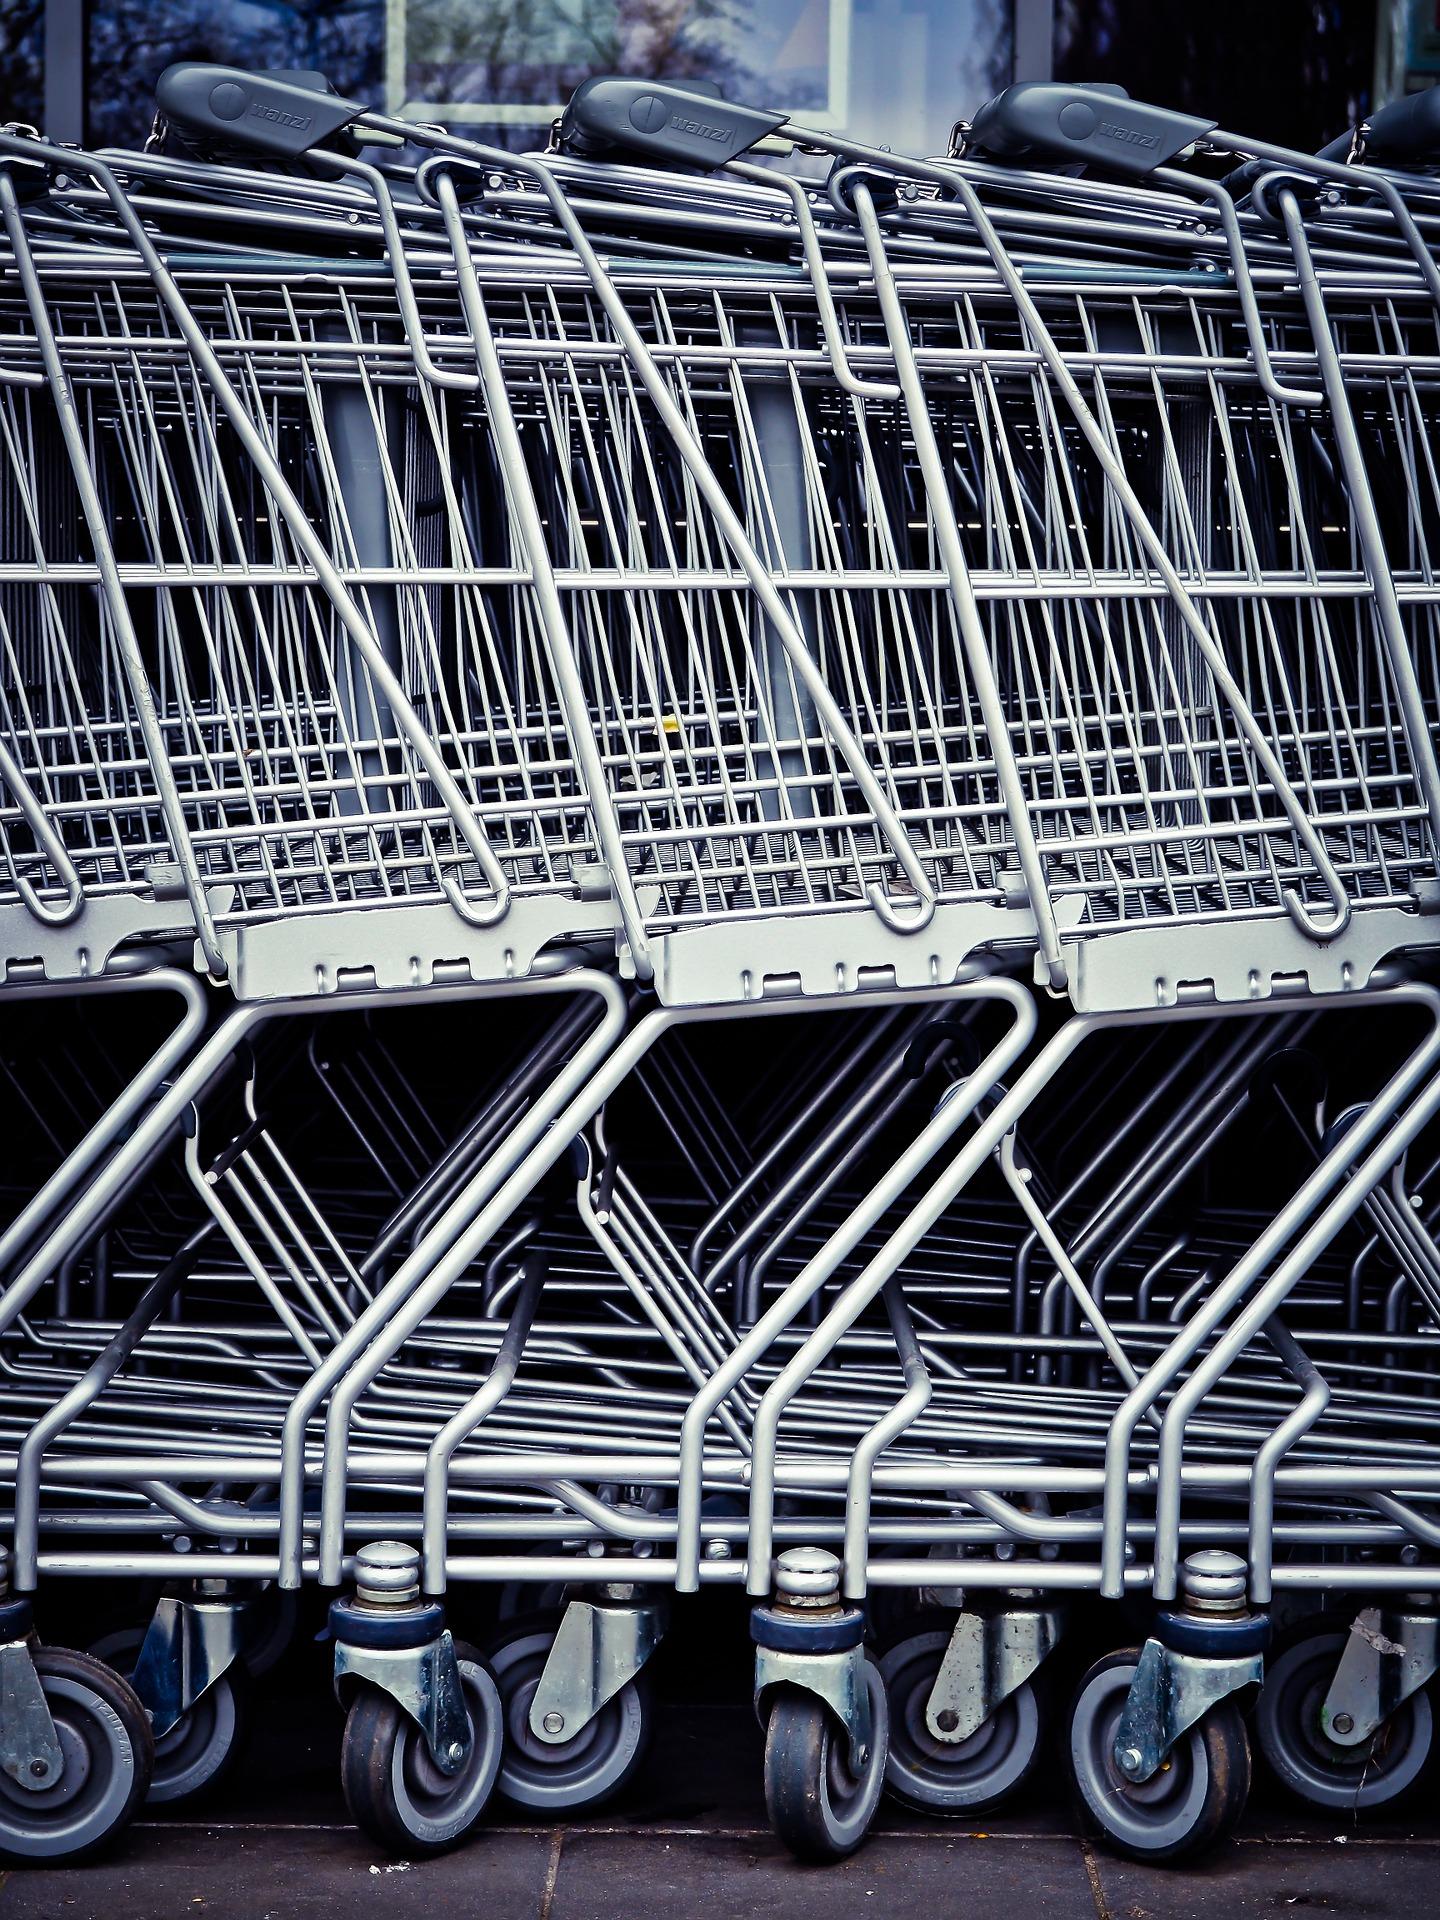 shopping-cart-1275483_1920.jpg